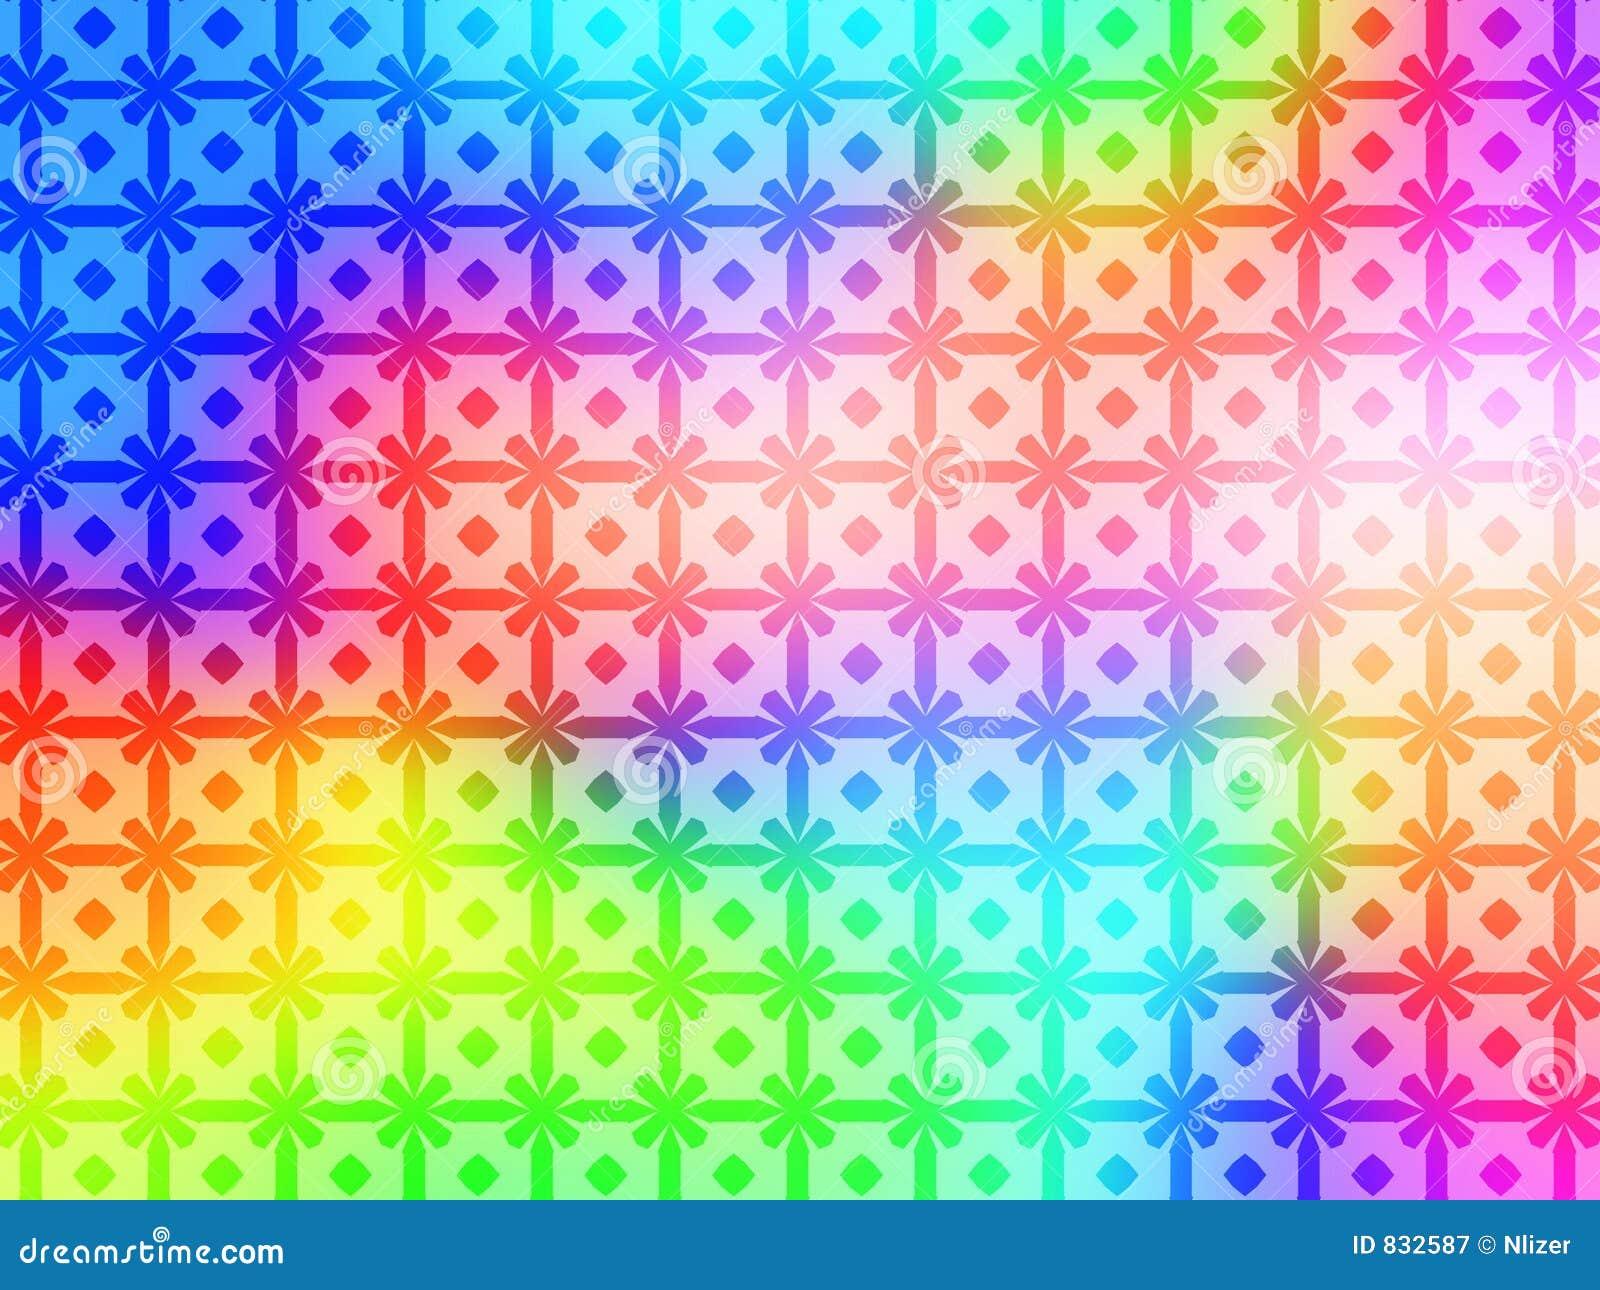 geometrische regenbogen muster hintergrundtapete lizenzfreie stockfotografie bild 832587. Black Bedroom Furniture Sets. Home Design Ideas